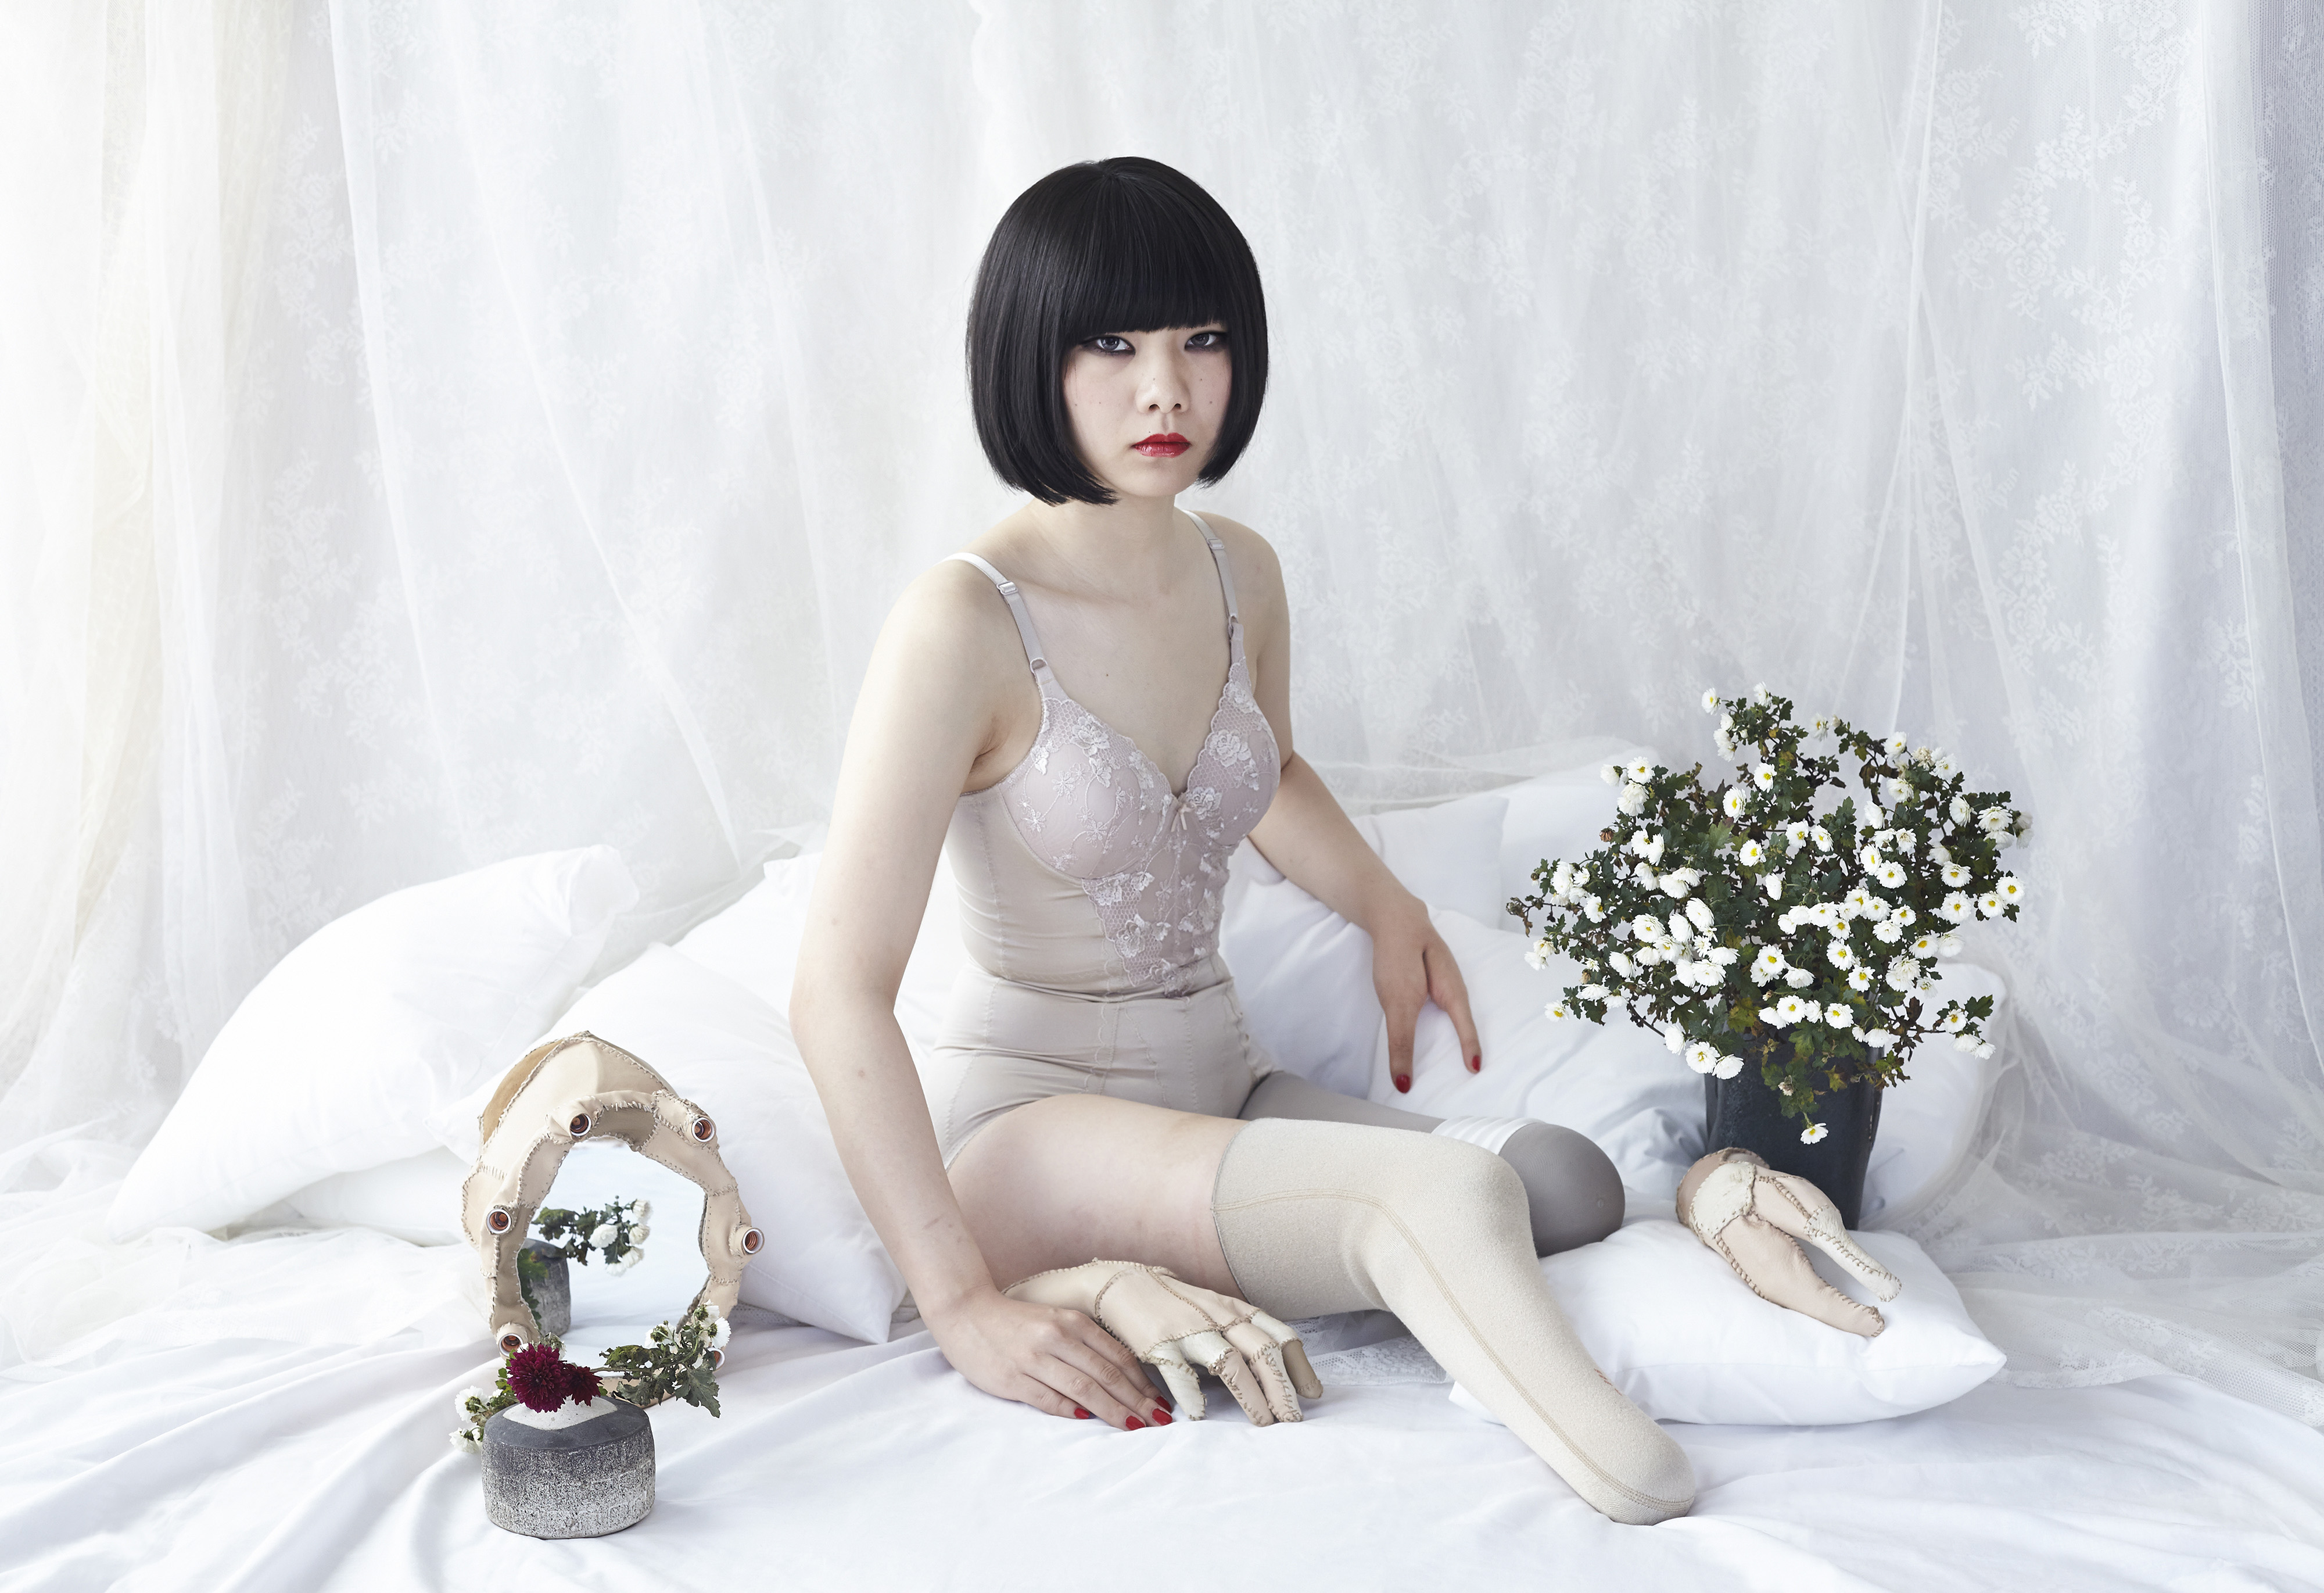 Mari Katayama, you're Mine #002, 2014. © Mari Katayama. Courtesy of rin art association